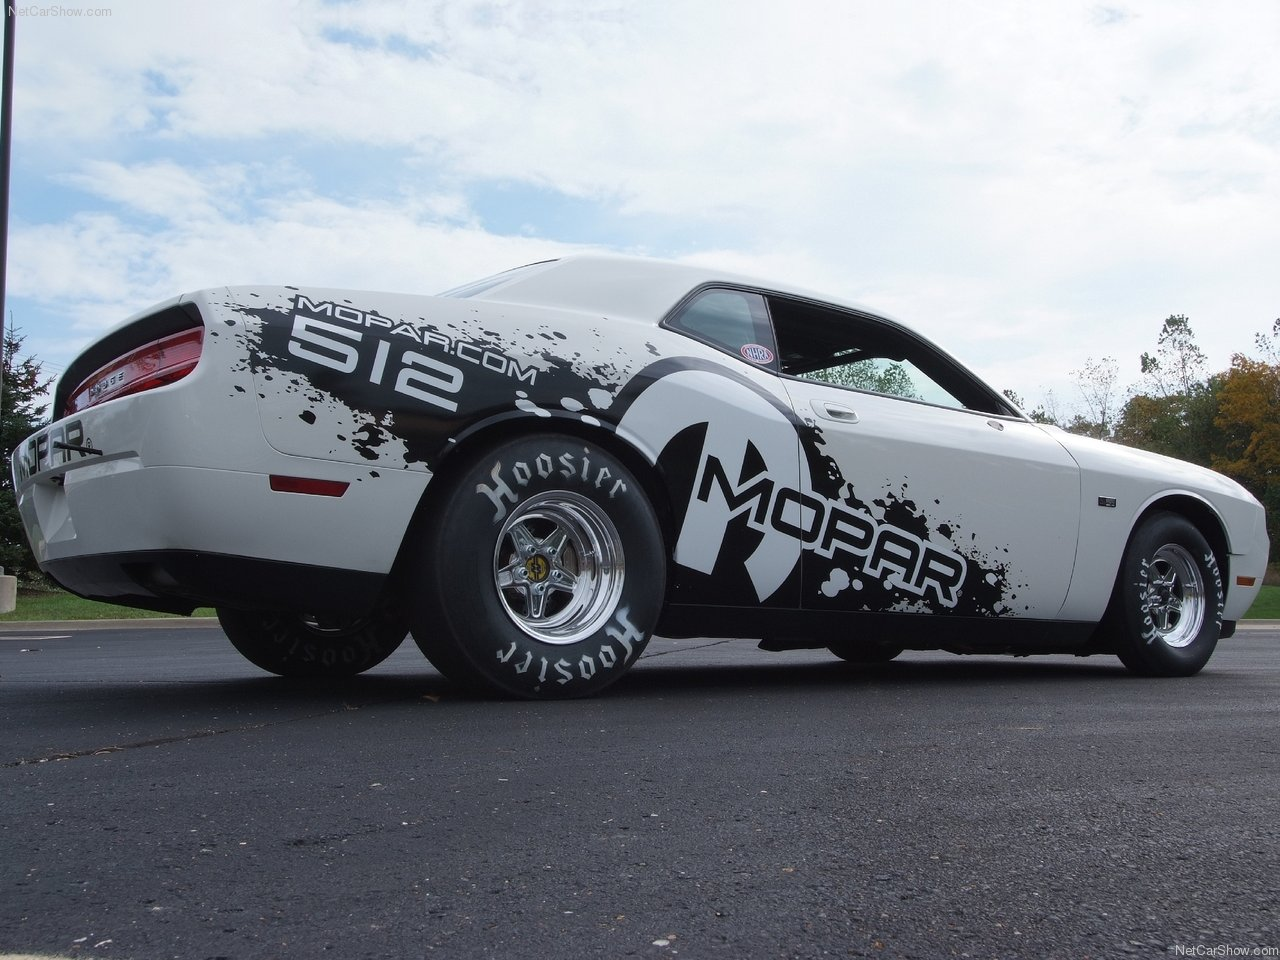 Based on the 2011 Dodge